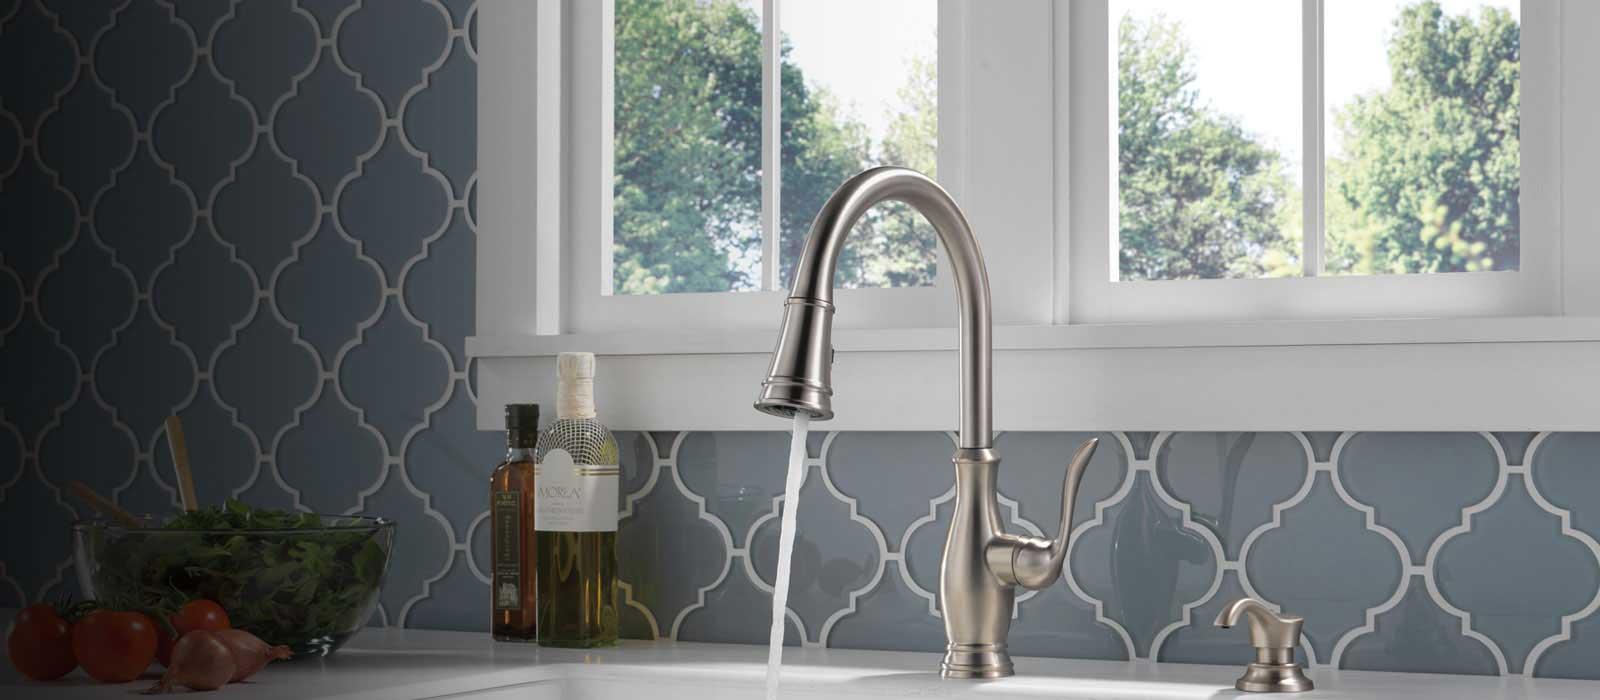 Zalia Kitchen Collection Delta Faucet